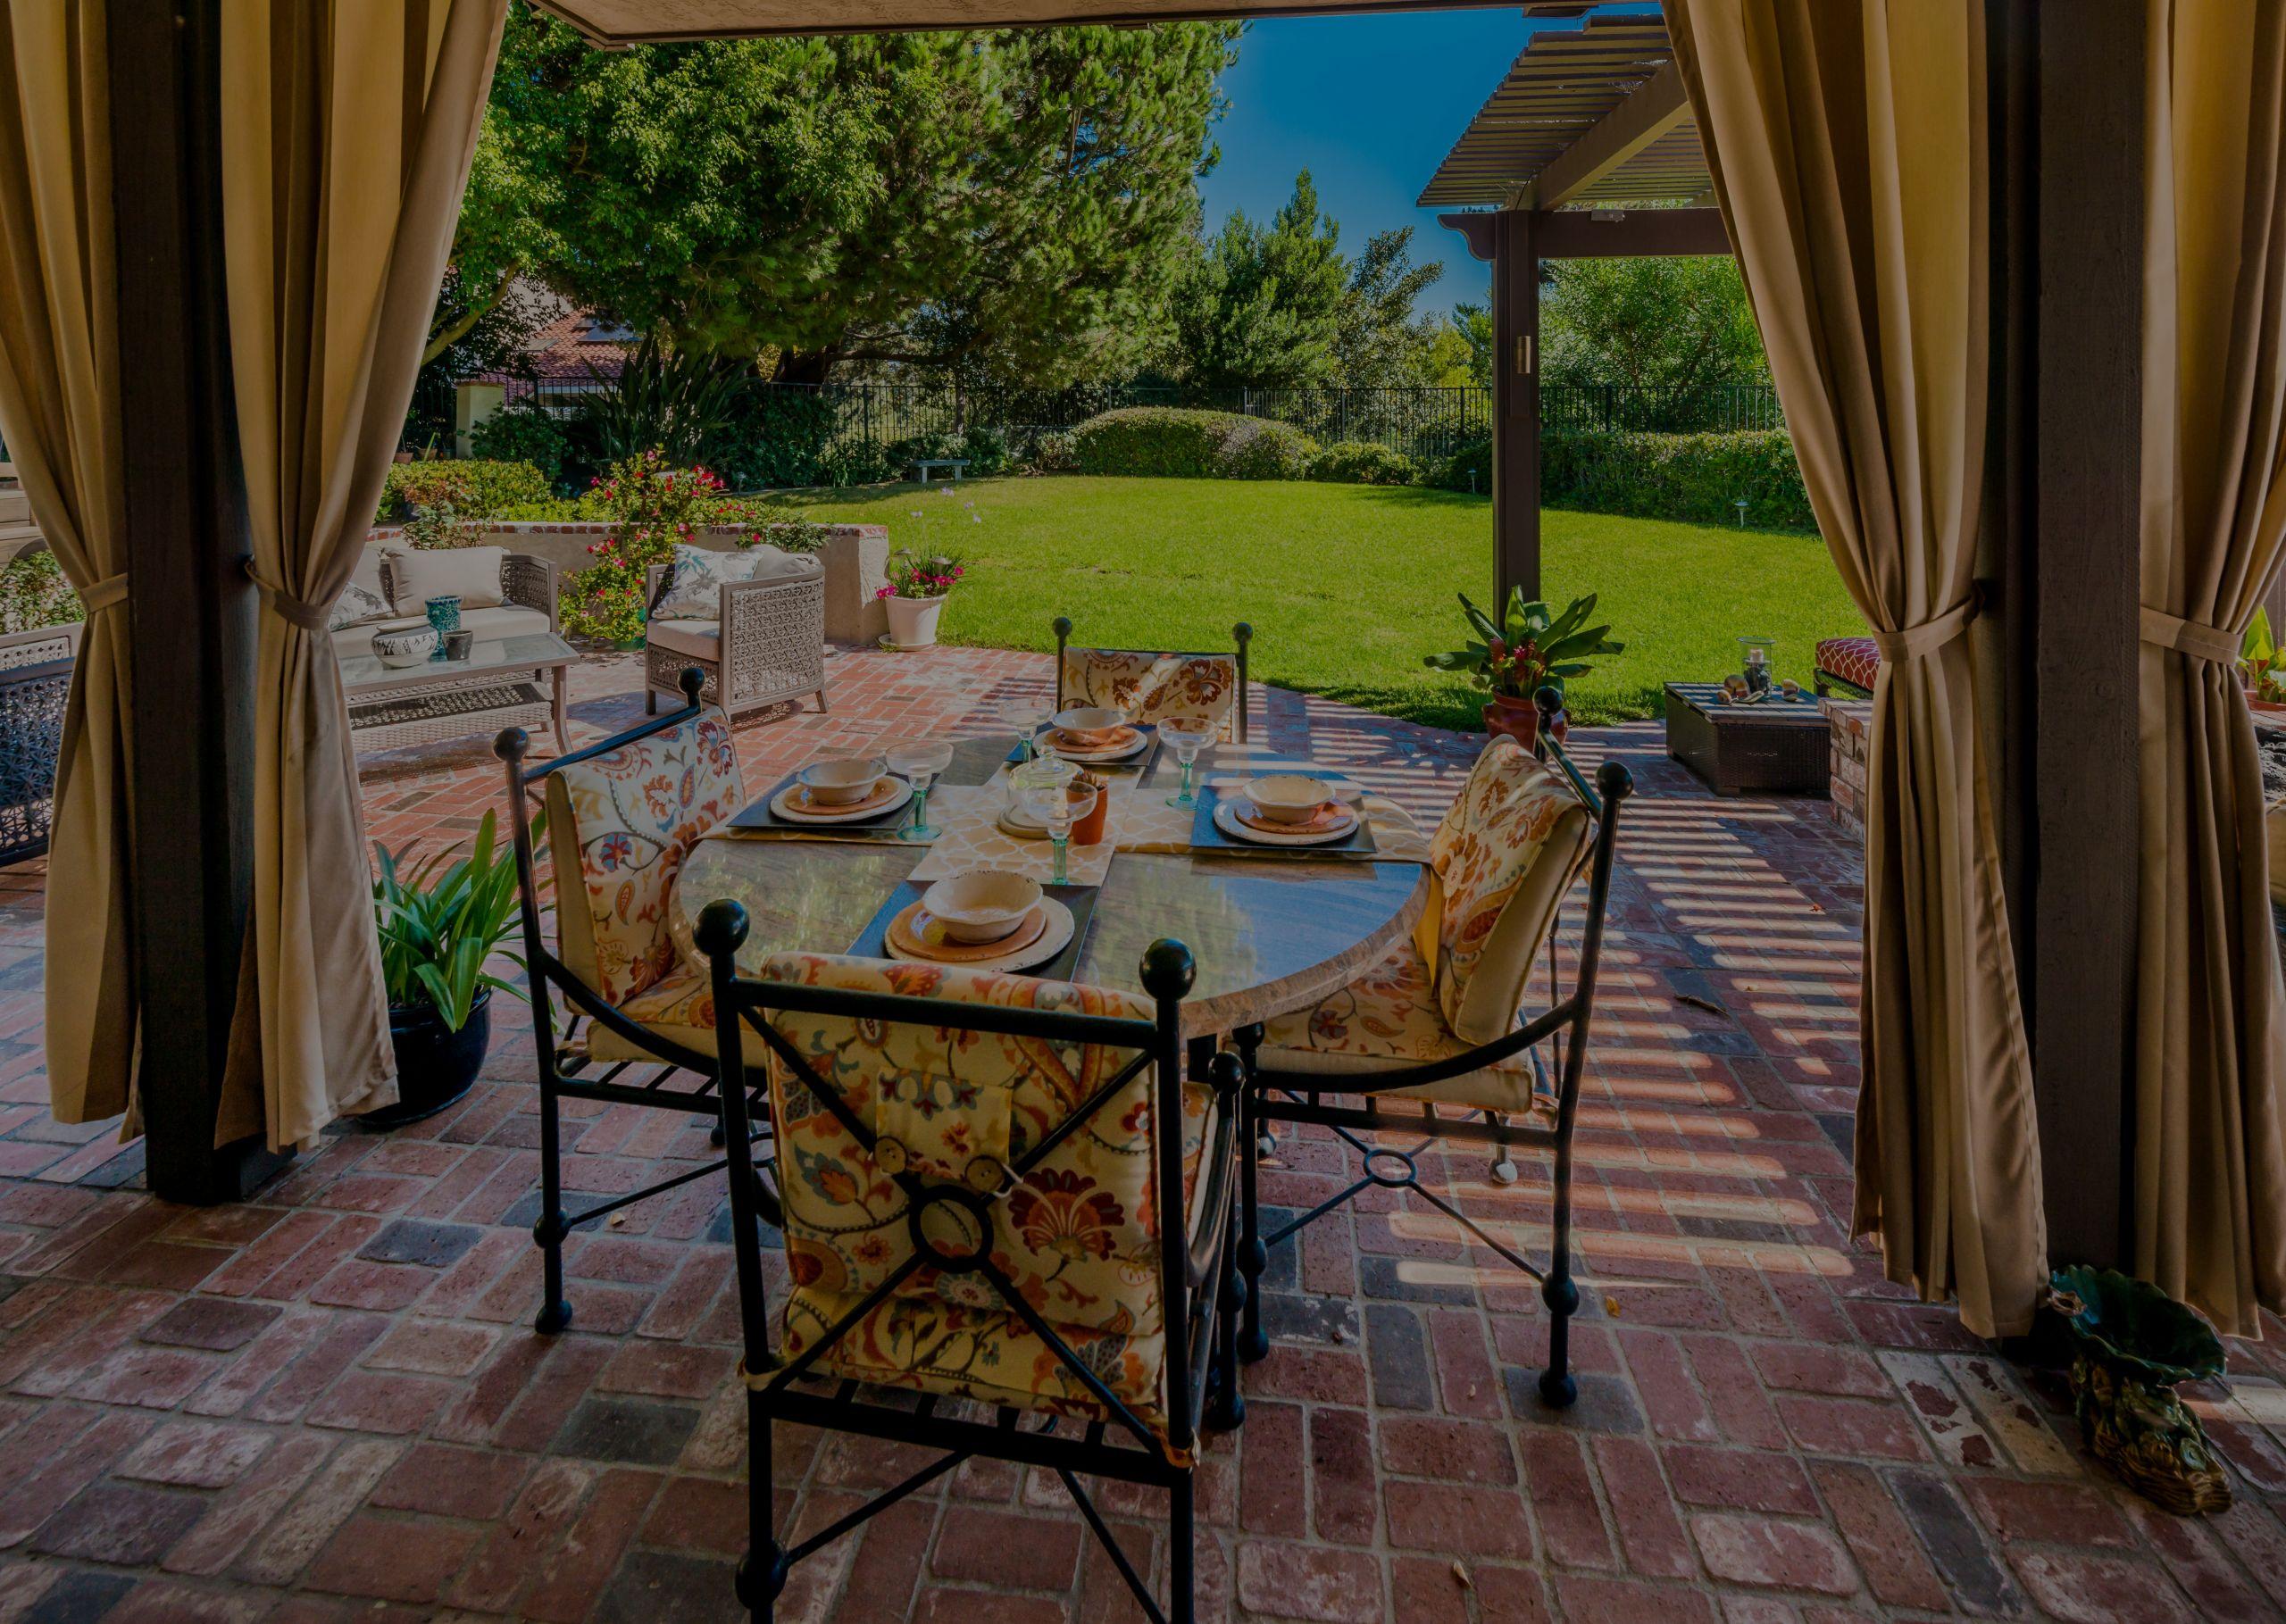 Home For Sale in Encinitas